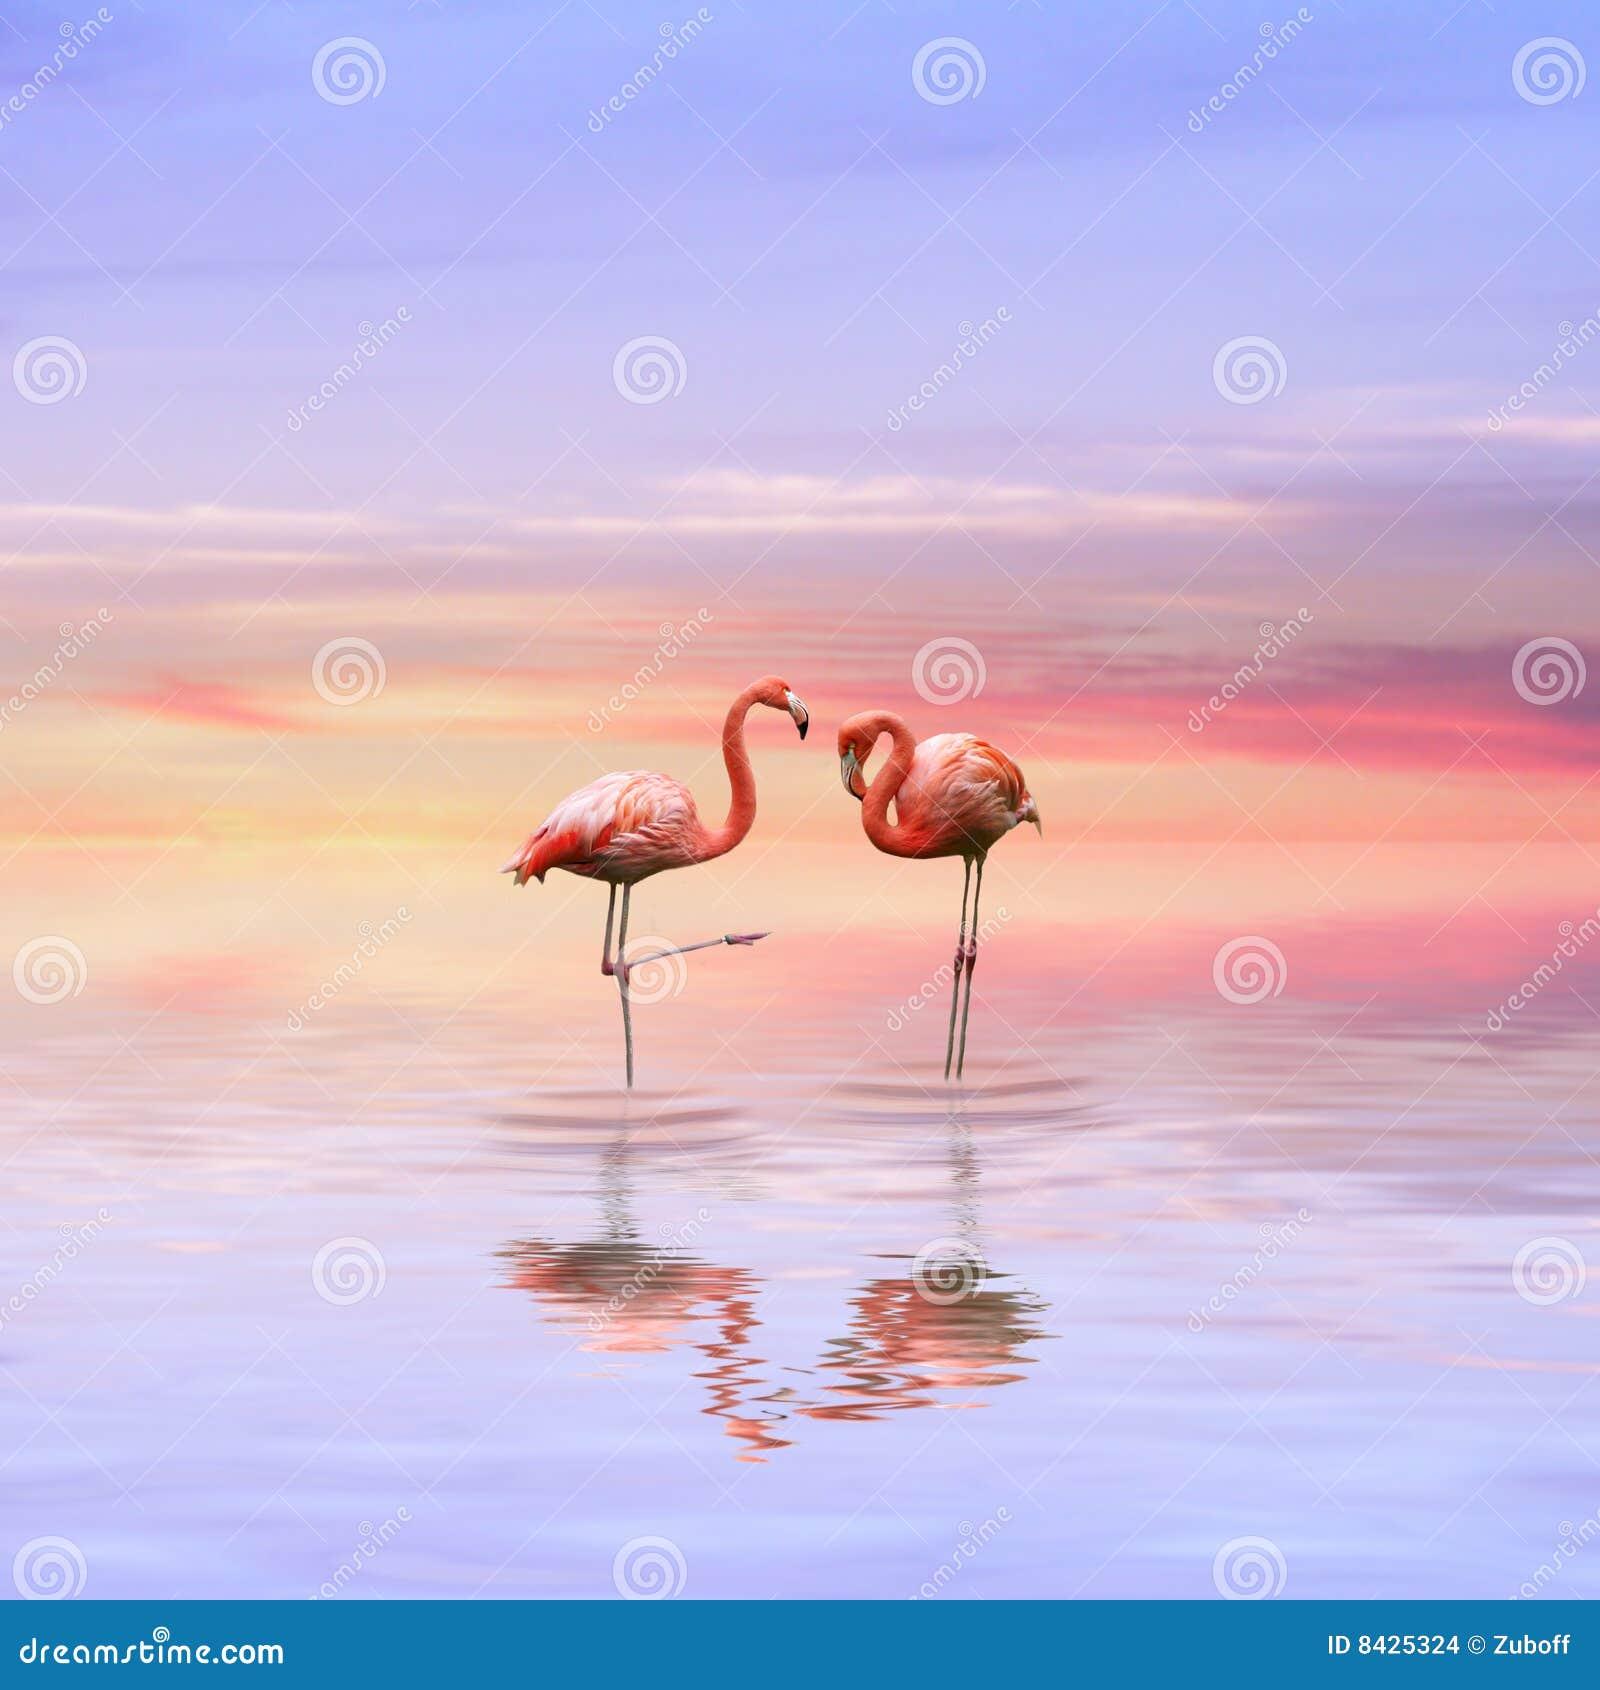 Flamingos love